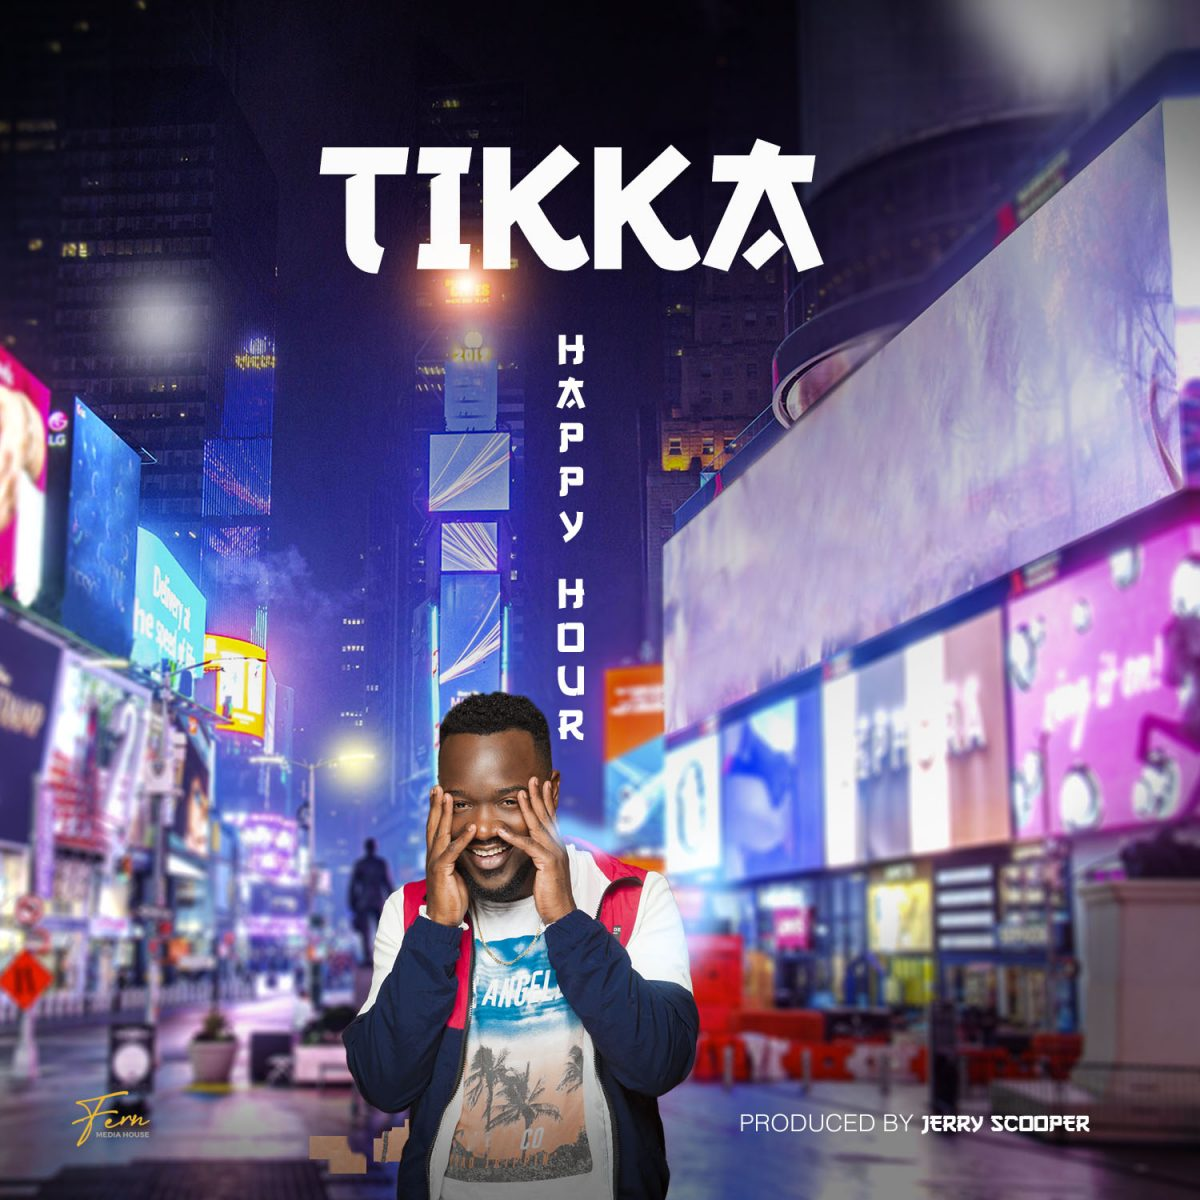 TikkA - Happy Hour